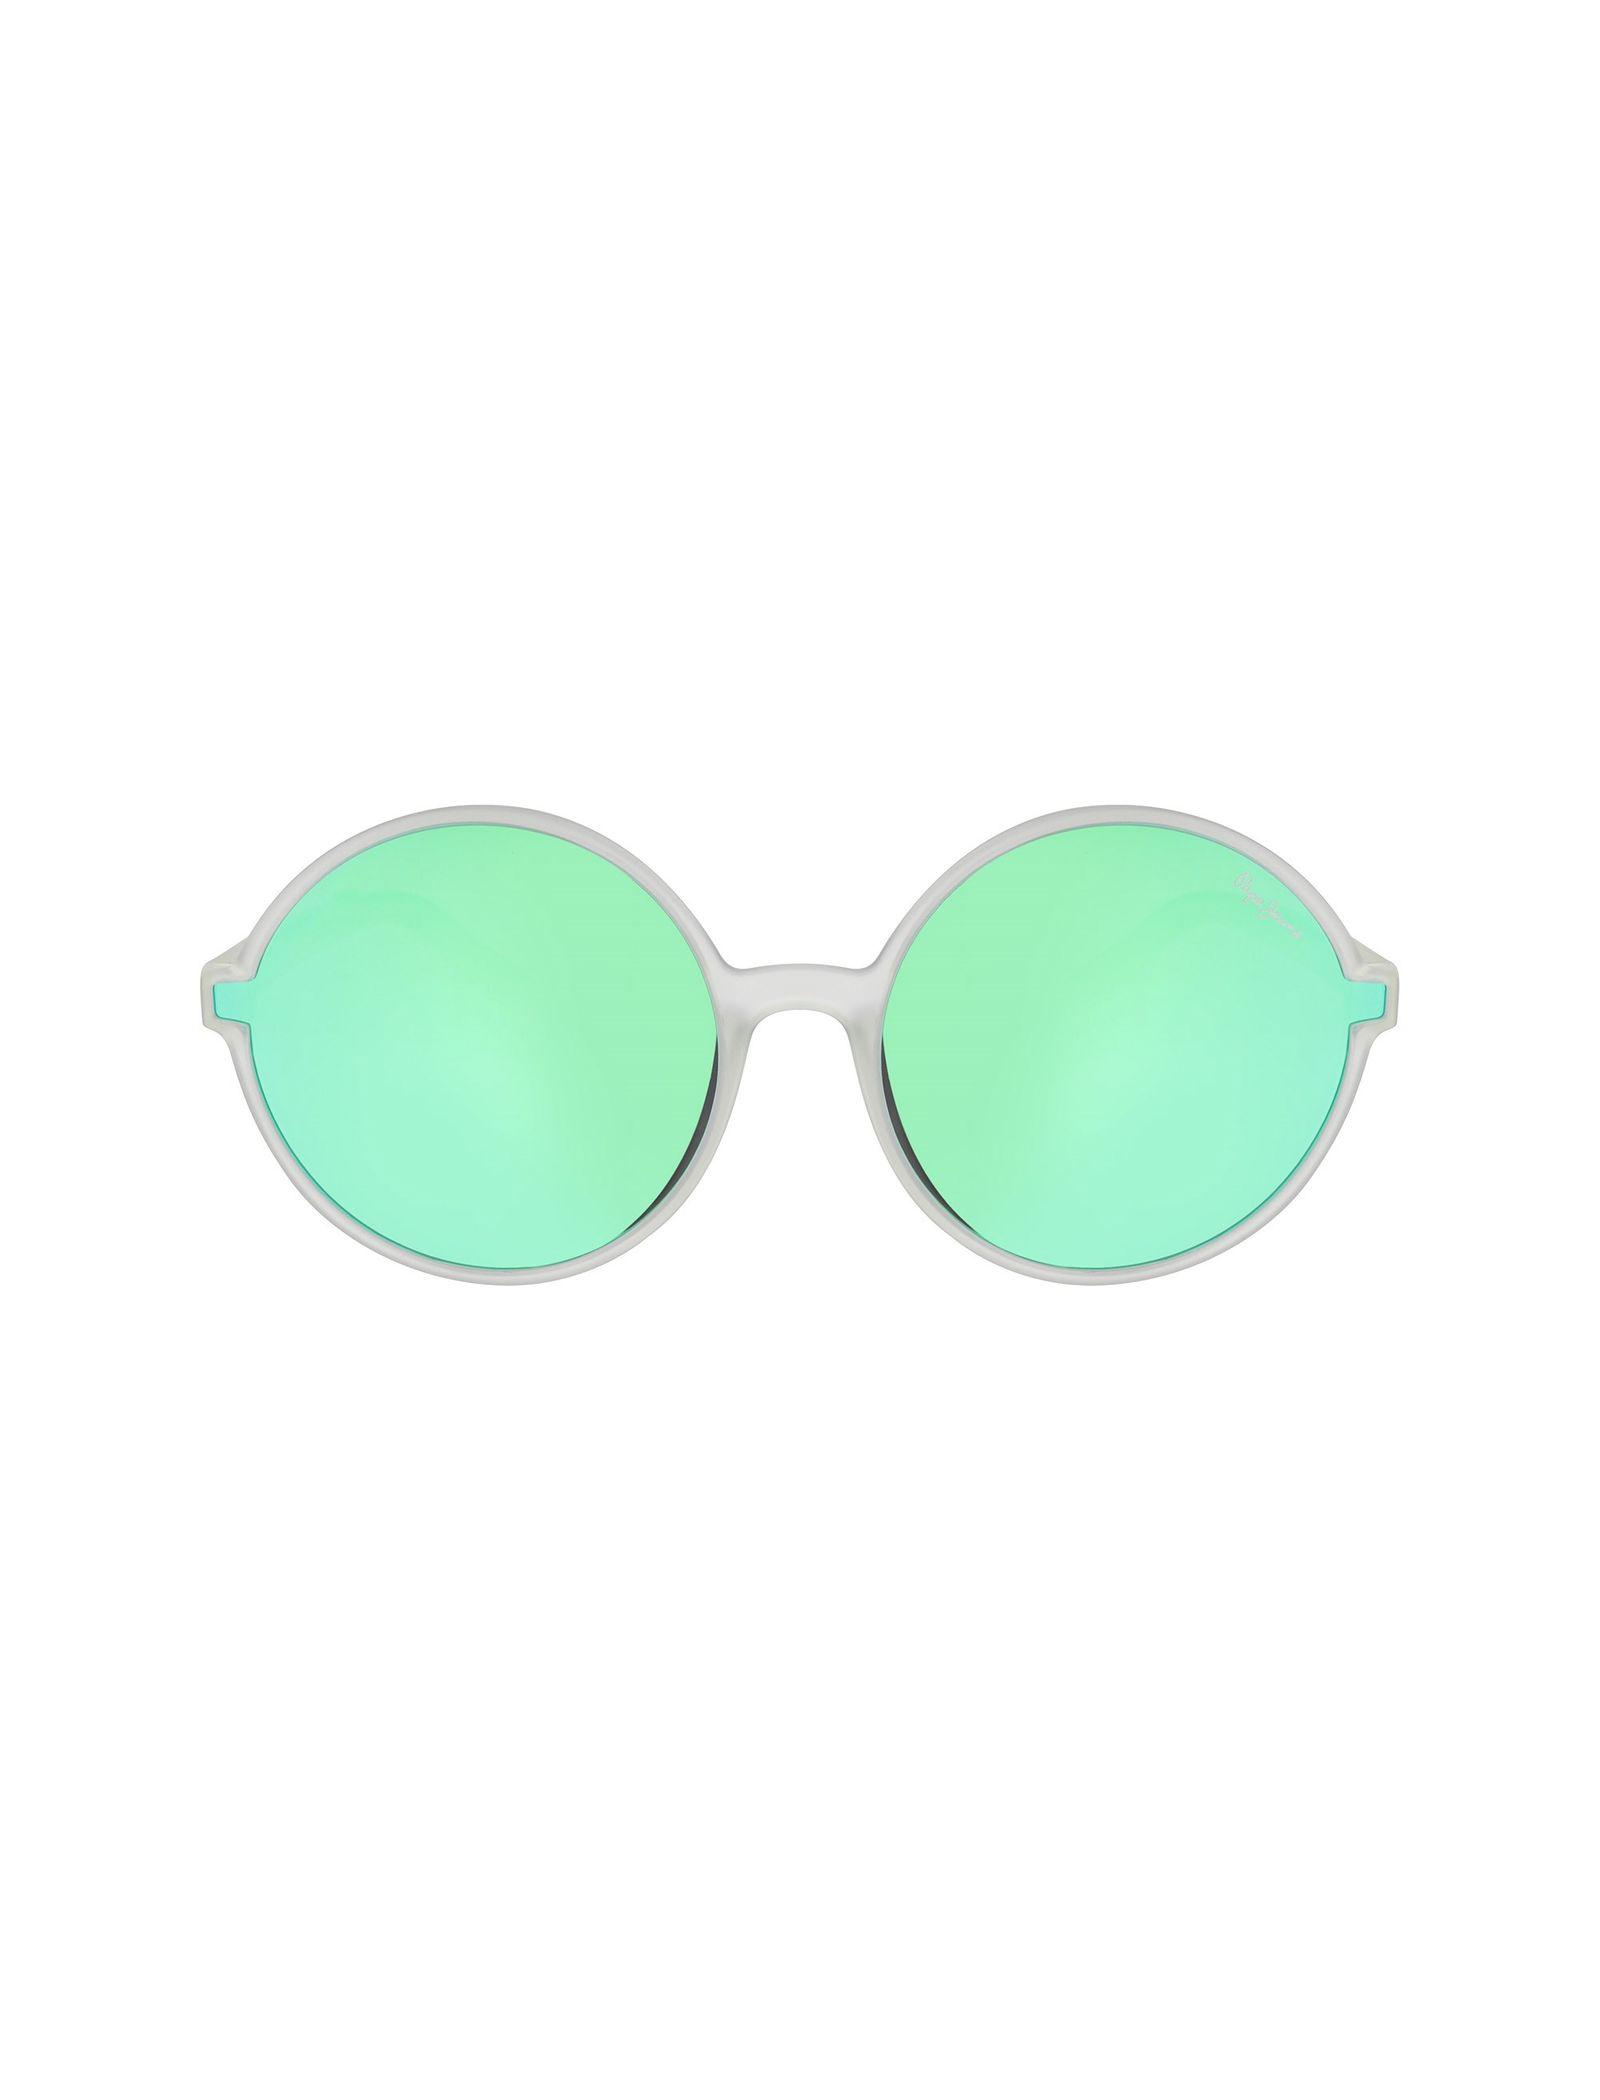 عینک آفتابی گرد زنانه - پپه جینز - شفاف - 1